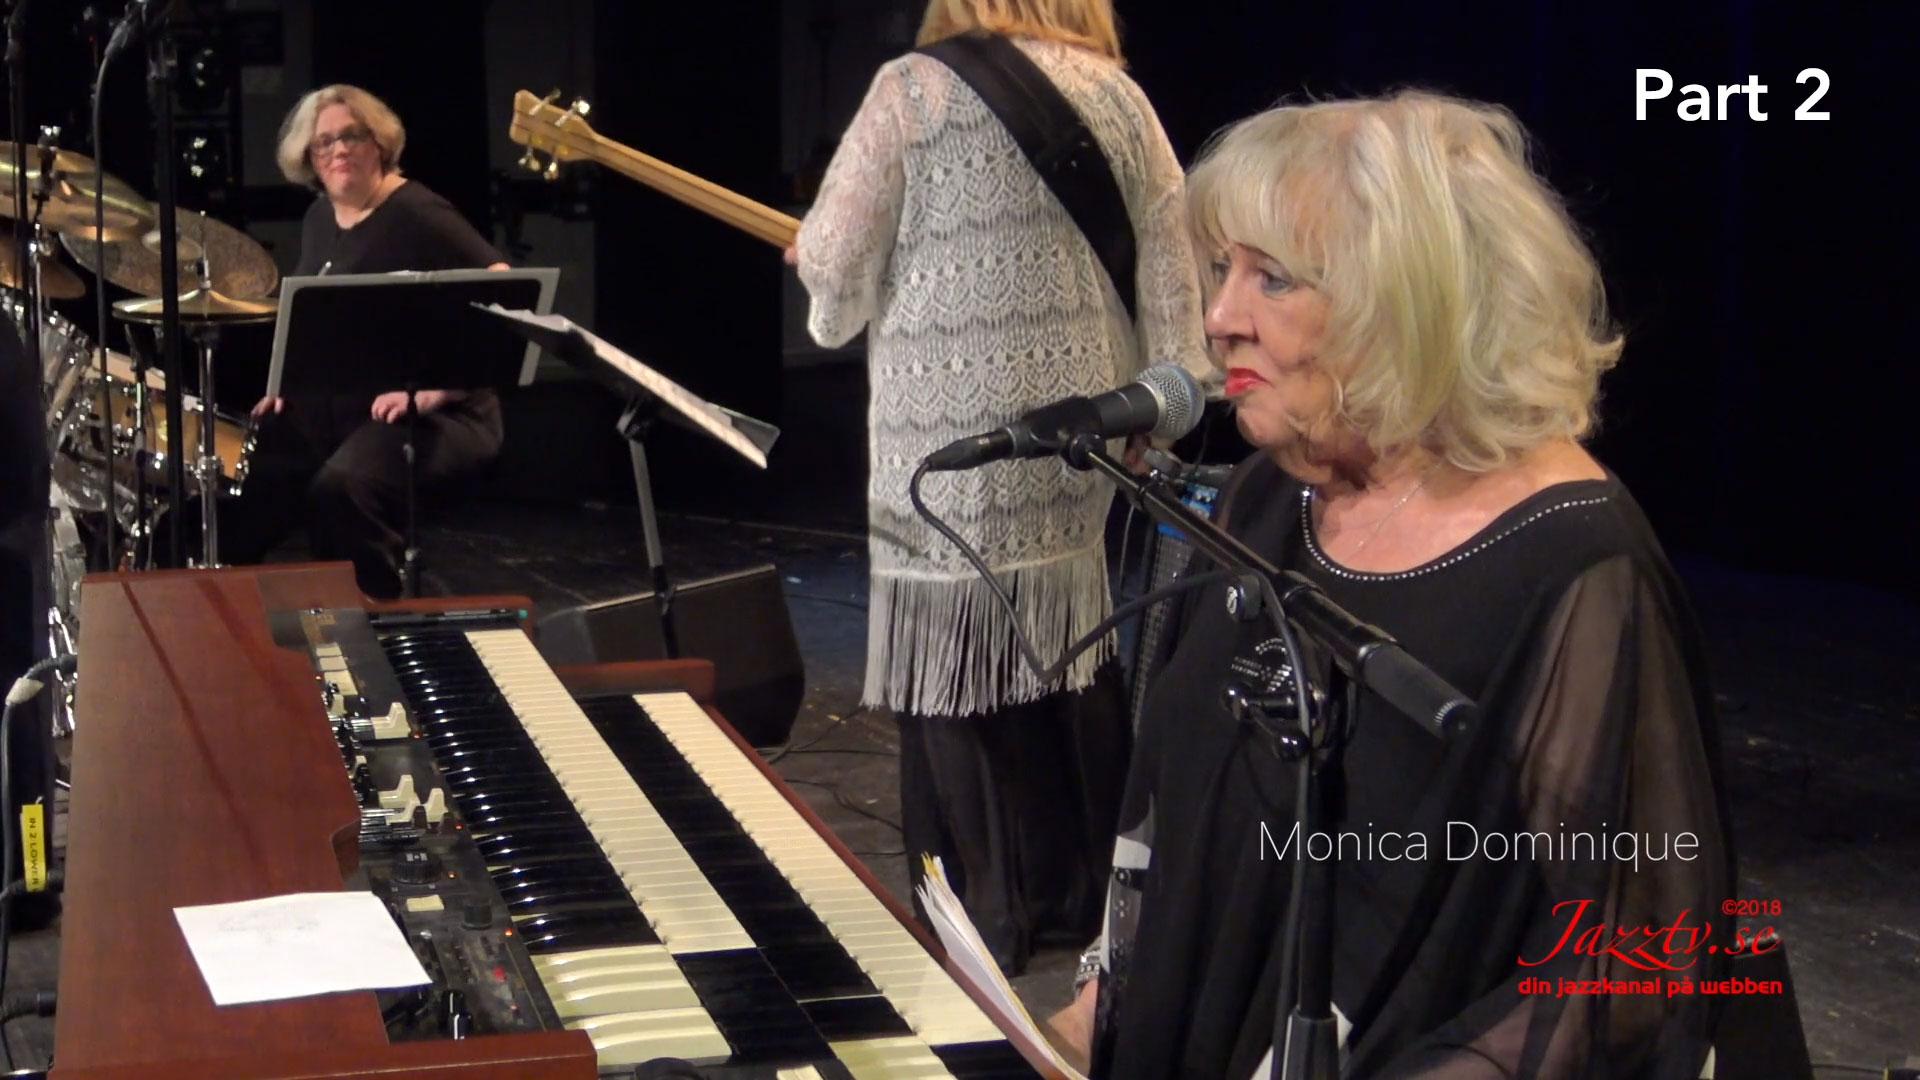 Organ jazz with Monica Dominique, Amanda Sedgwick & Hayati Kafe